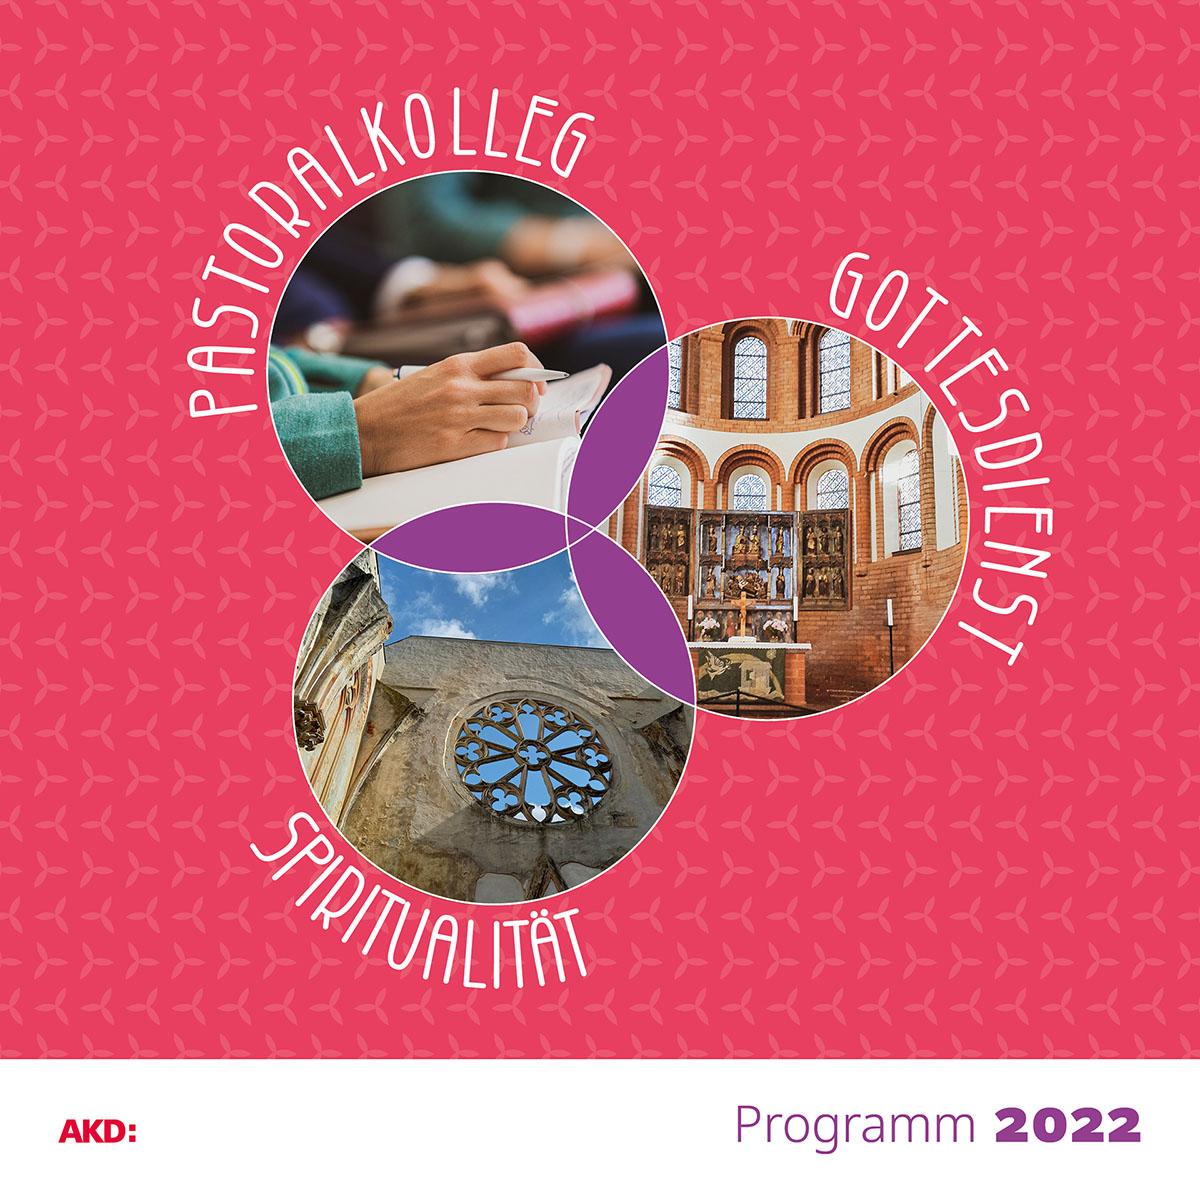 Programm 2022